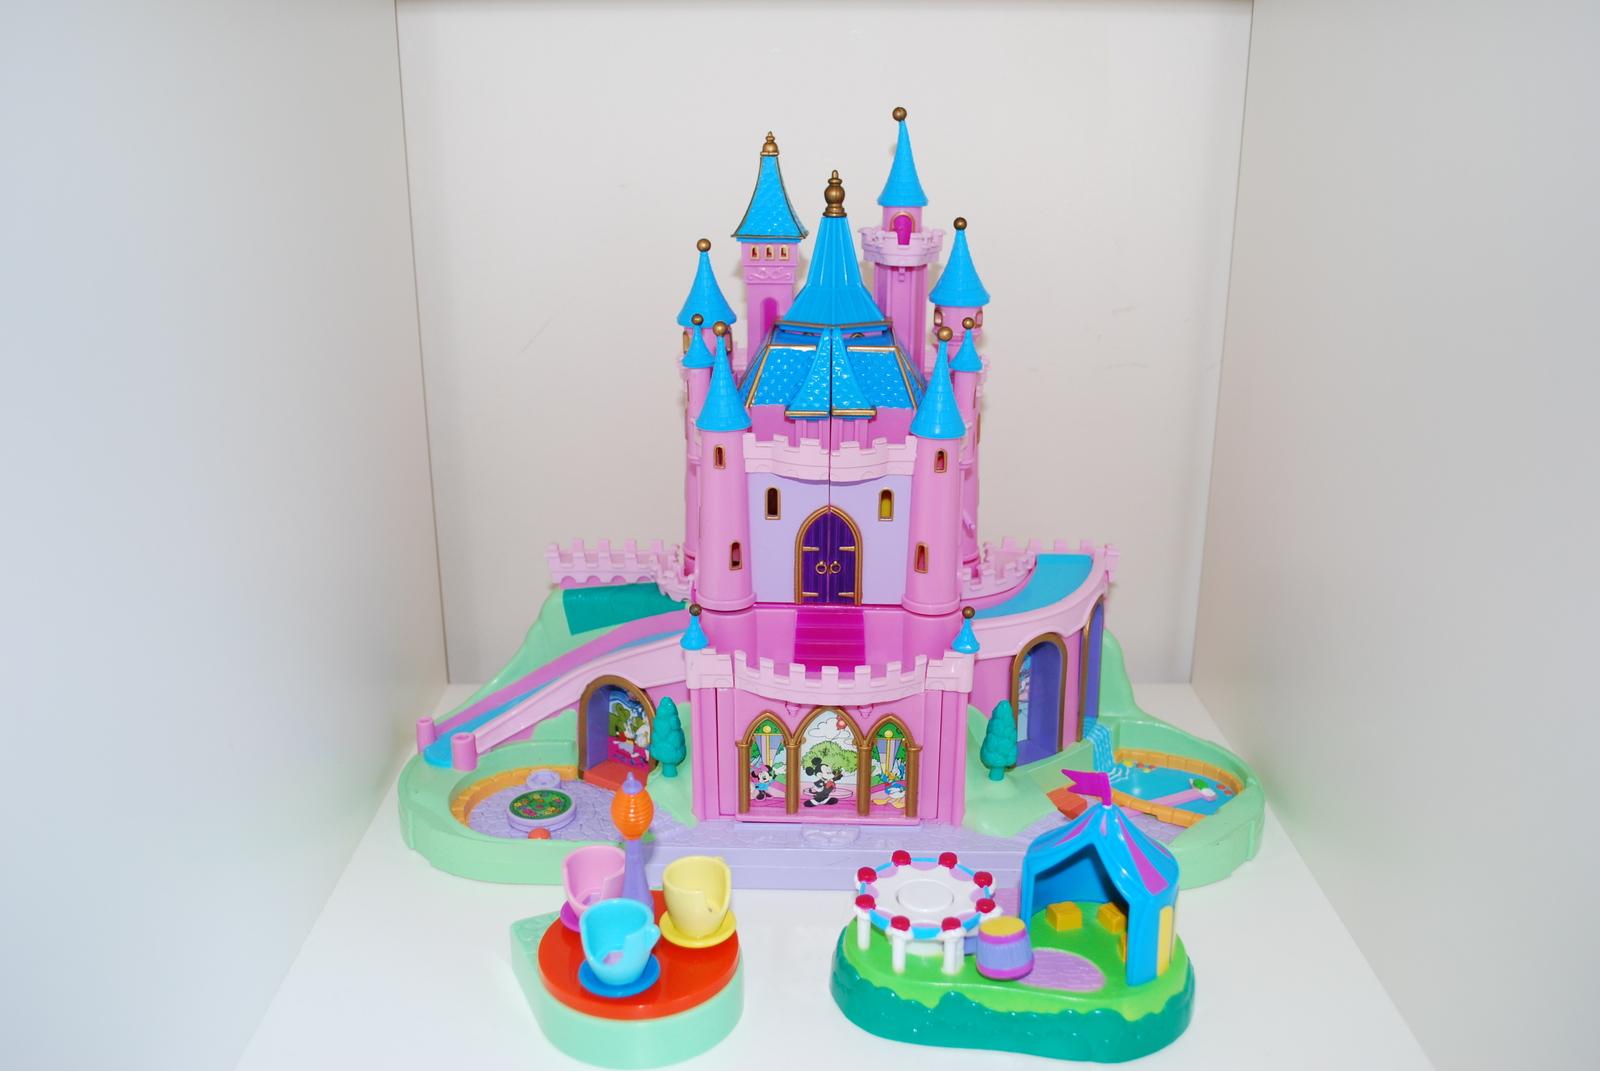 Polly Pocket Magic Kingdom Disney Castle Train Parts Replacement Pieces Teacups